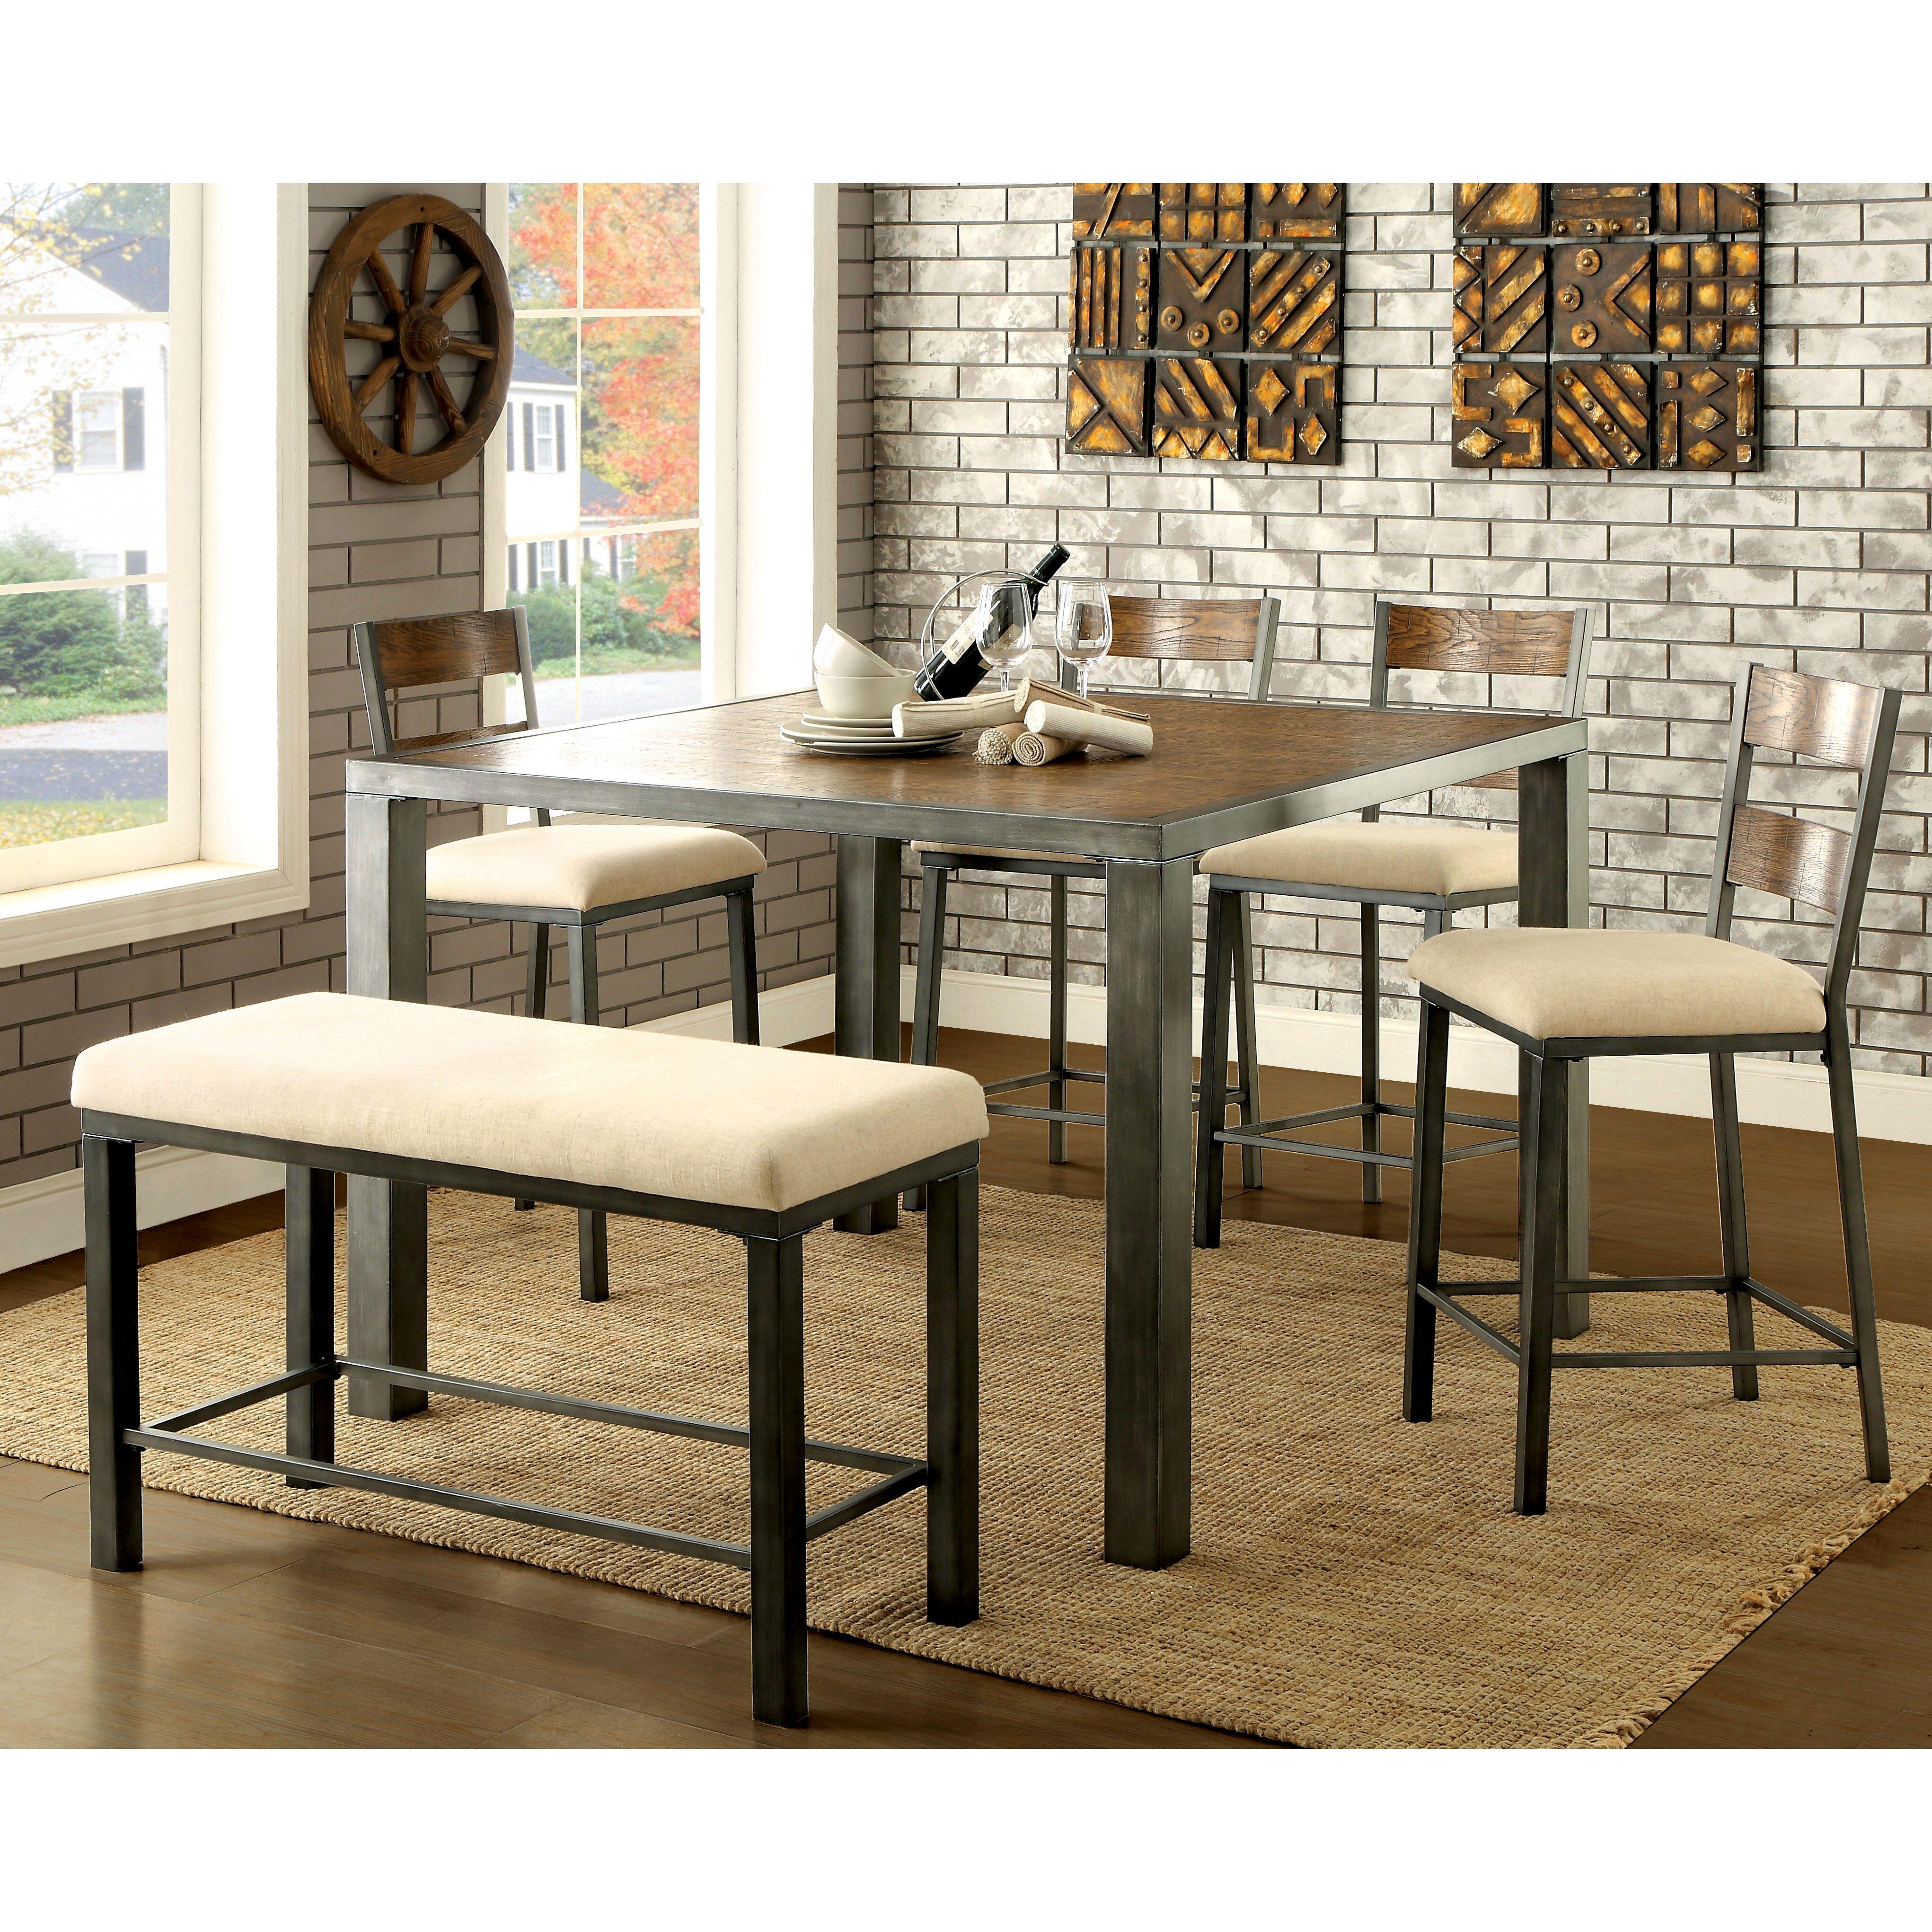 Hokku Designs Alleso Upholstered Kitchen Bench & Reviews